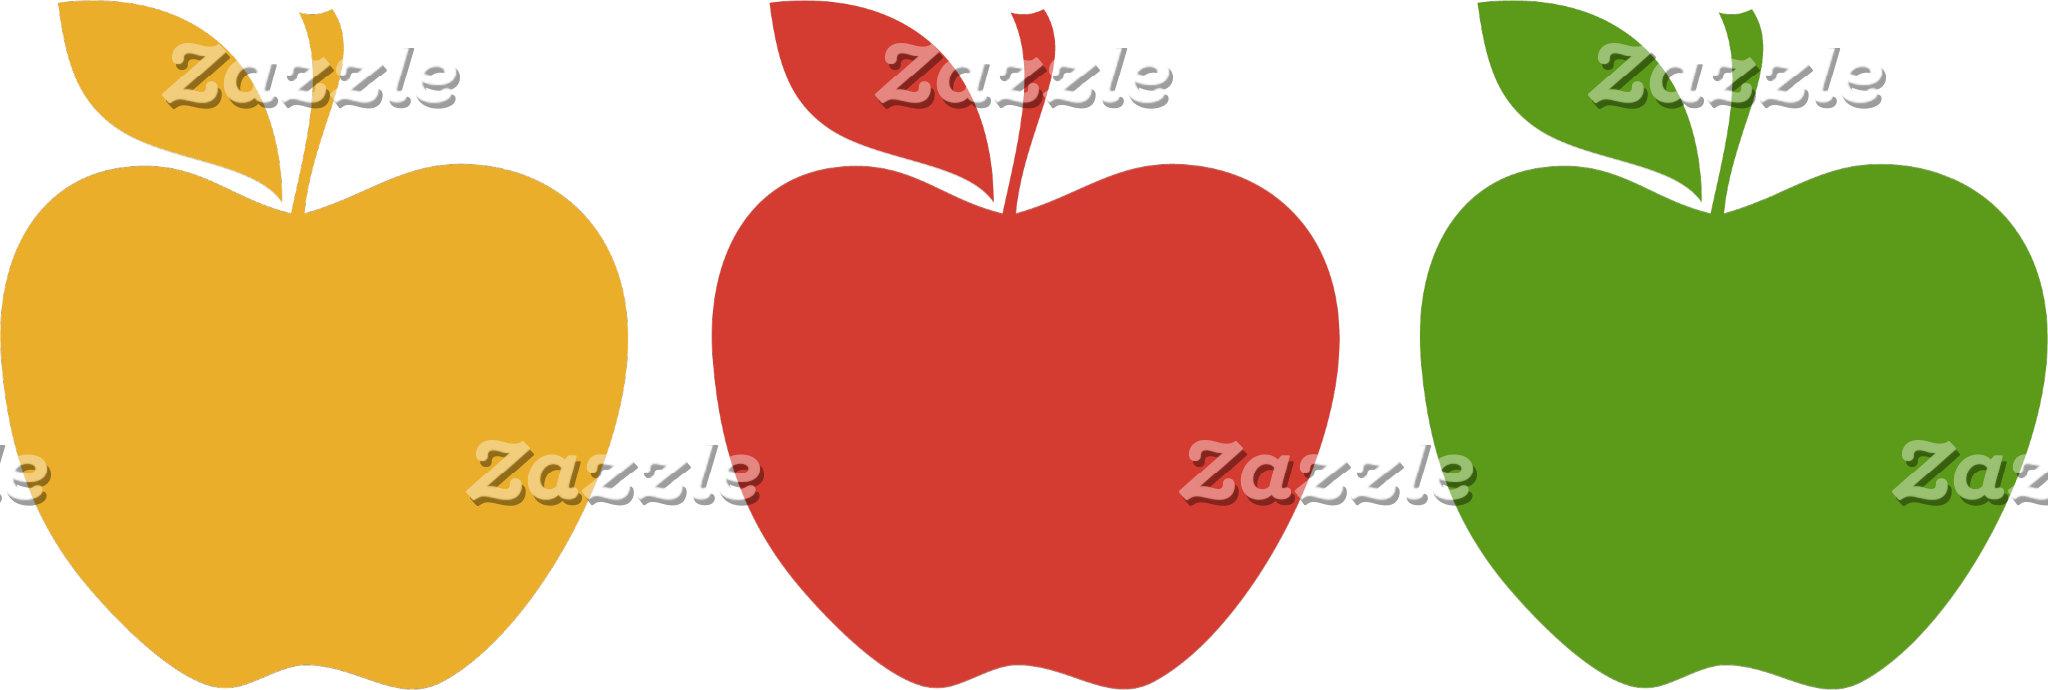 Apples / Teachers